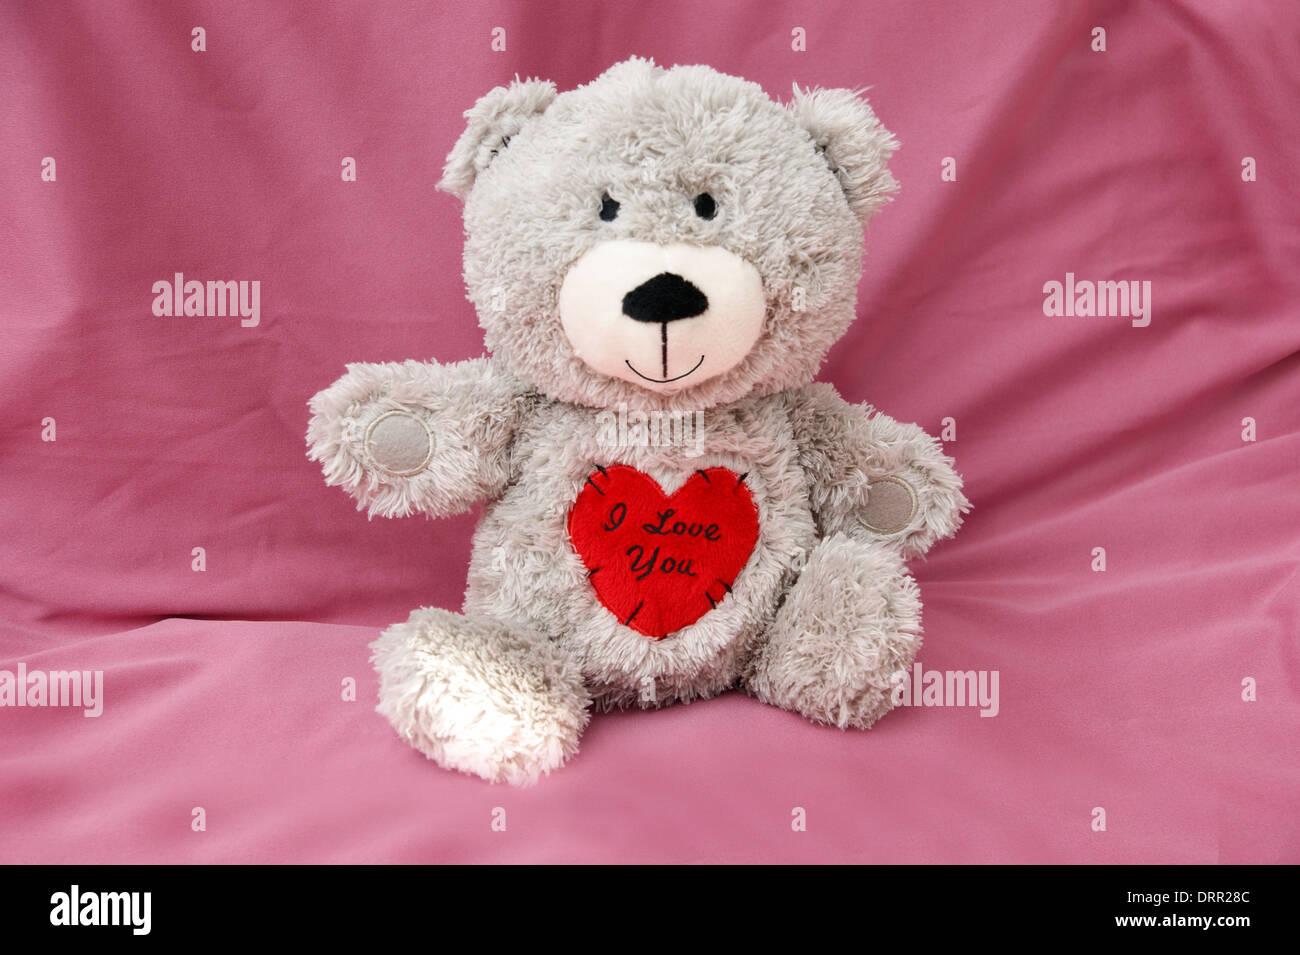 Pictures Of Teddy Bears Saying I Love You Wwwpixshark